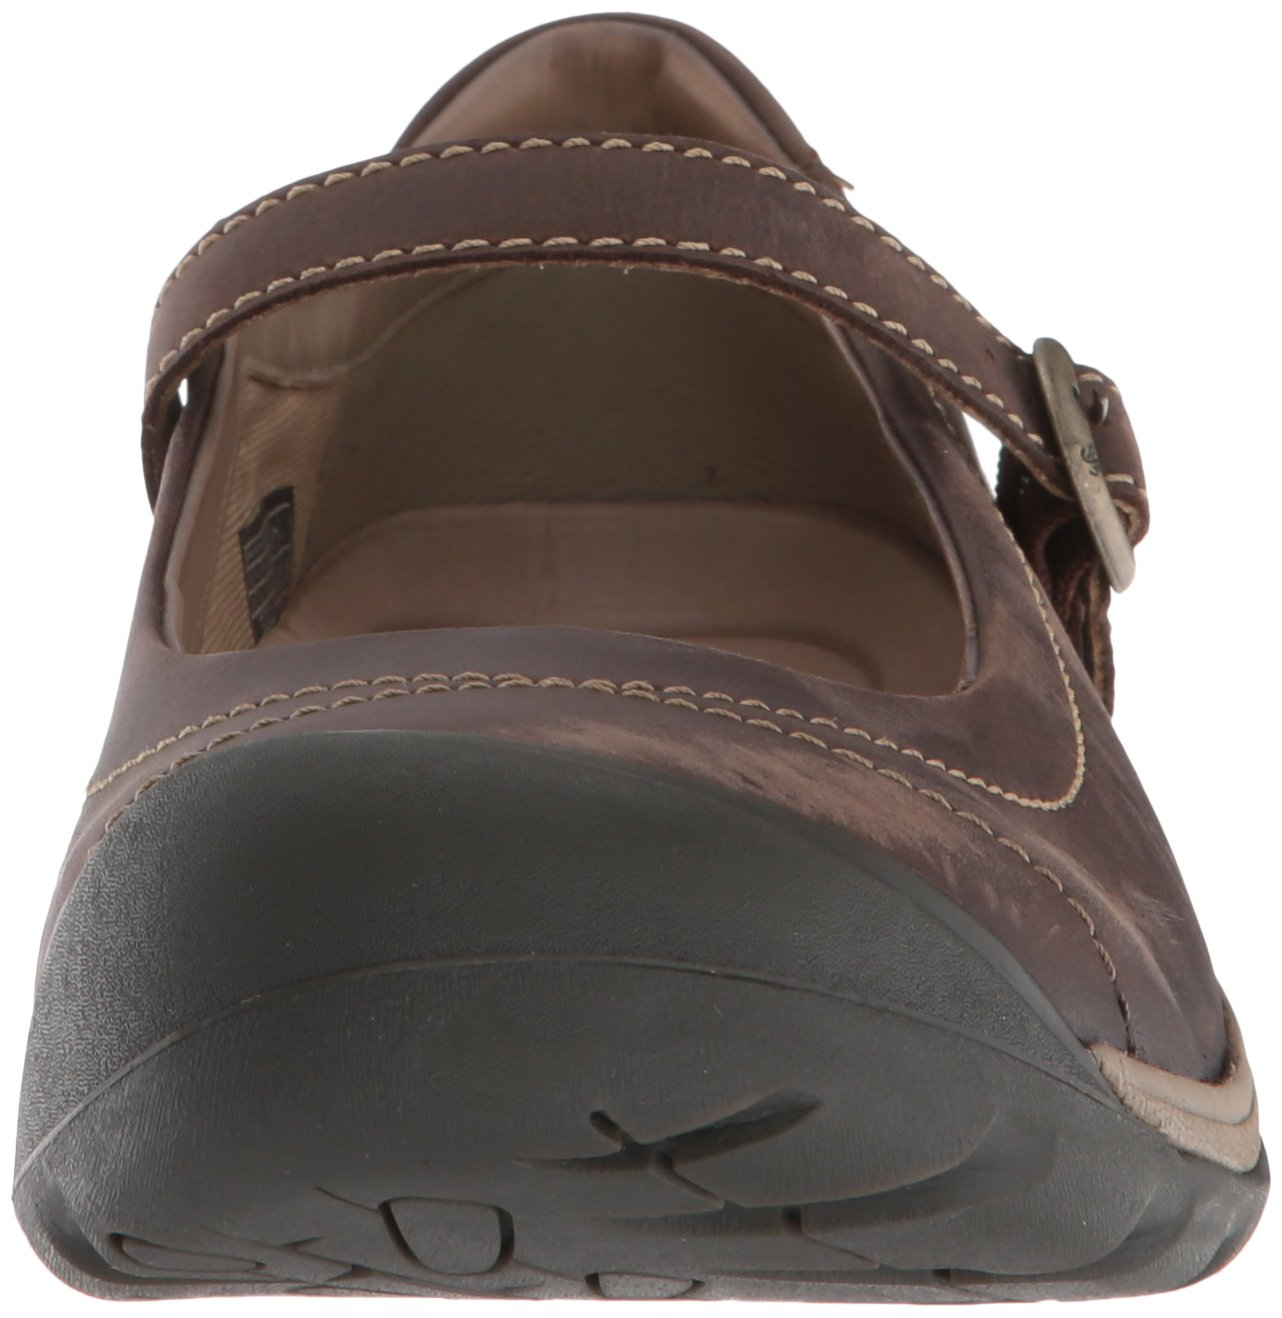 KEEN Women's Presidio II MJ-W Hiking Shoe, Infield/Cornstalk, 8.5 M US 4